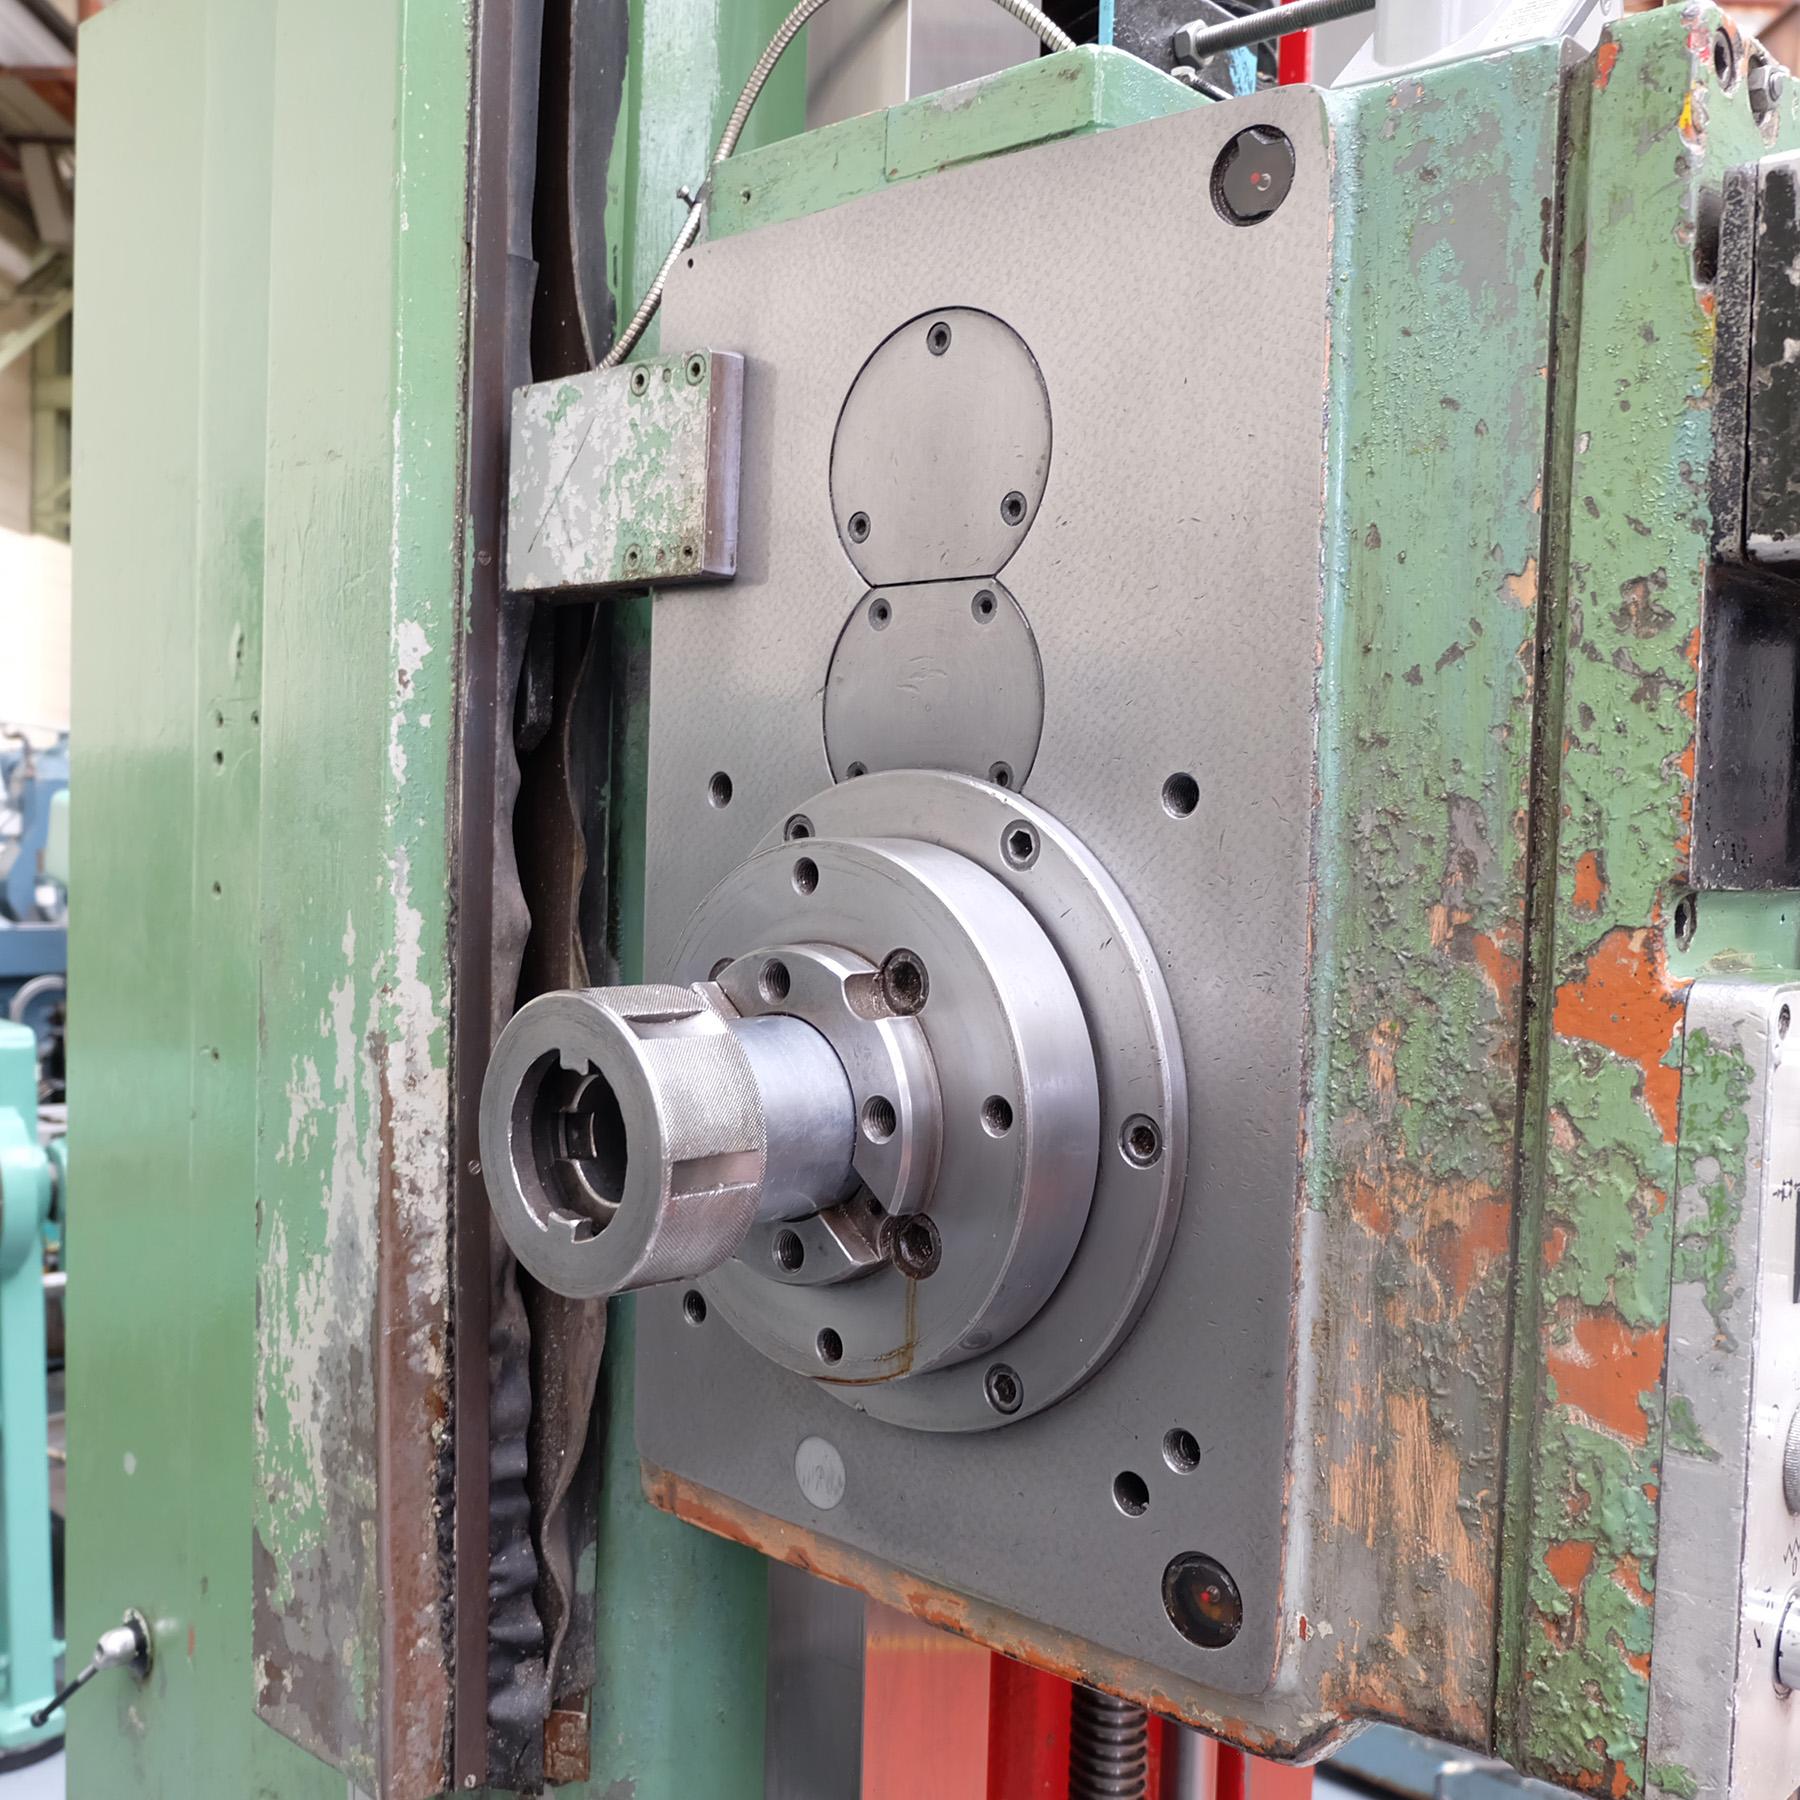 Ceruti Model ABC 75 Horizontal Boring & Milling Machine. With Tooling. - Image 9 of 15